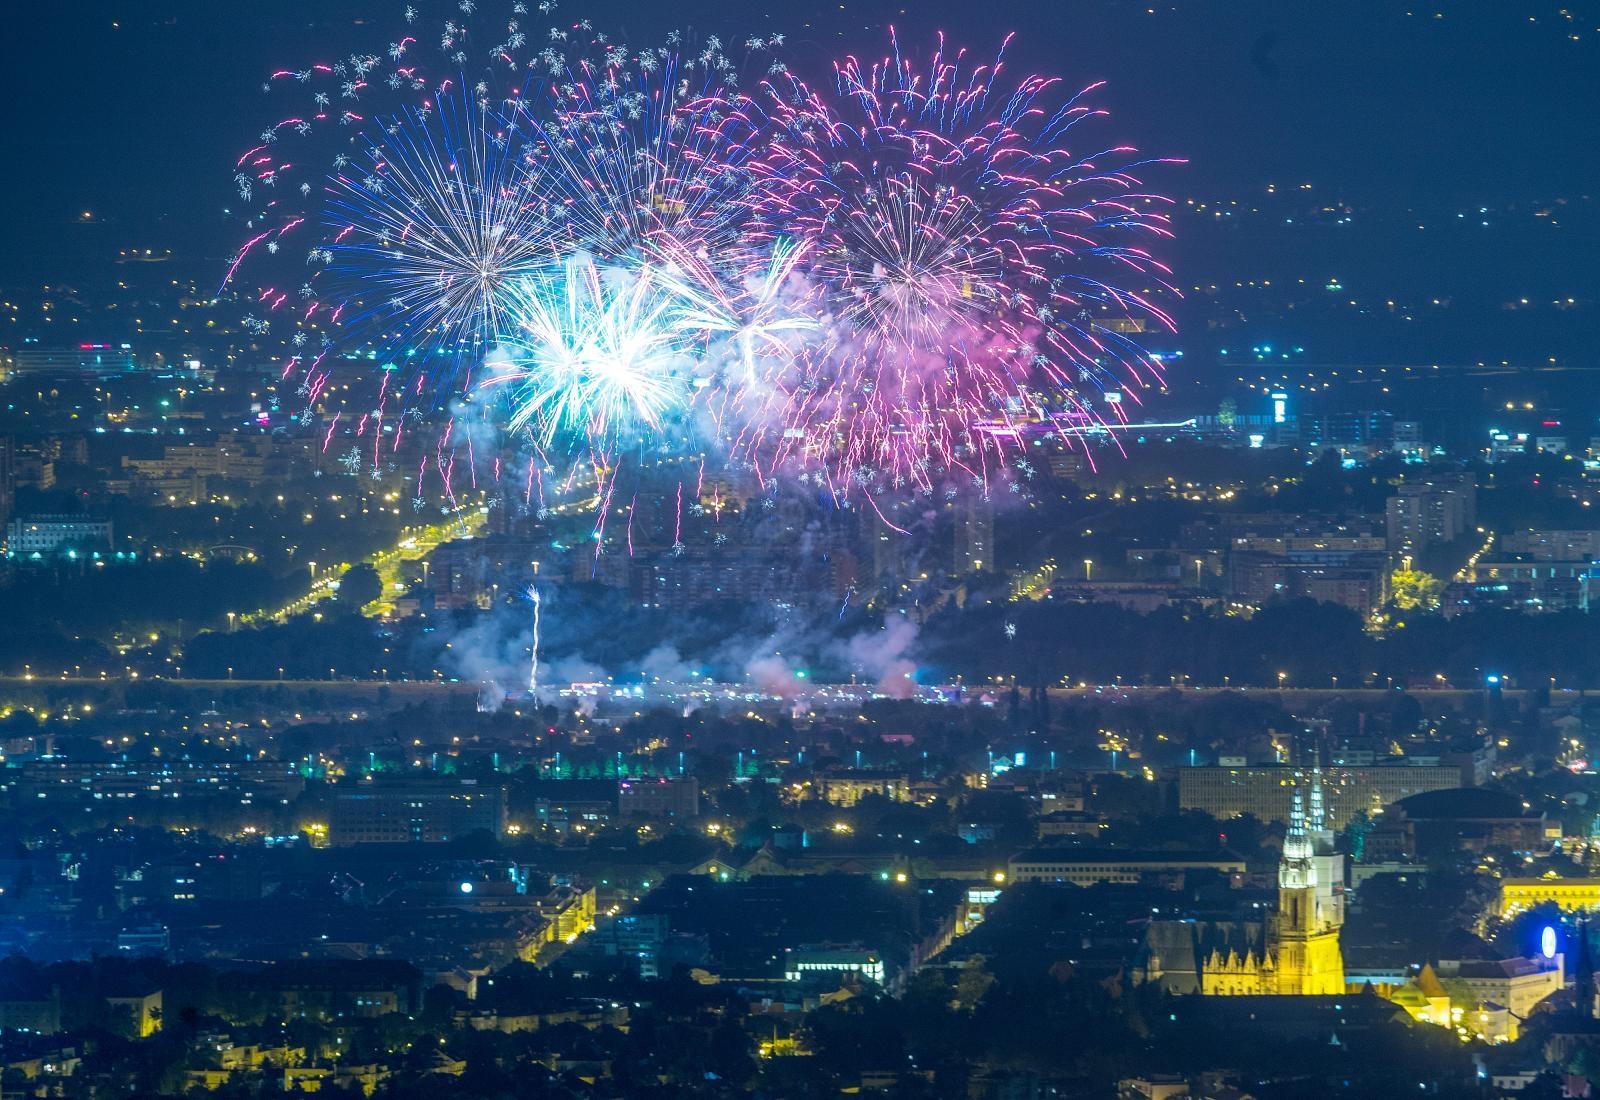 VIDEO: Svjetlosnim spektaklom nizozemskog Heron Fireworksa otvoren 19. Festival vatrometa